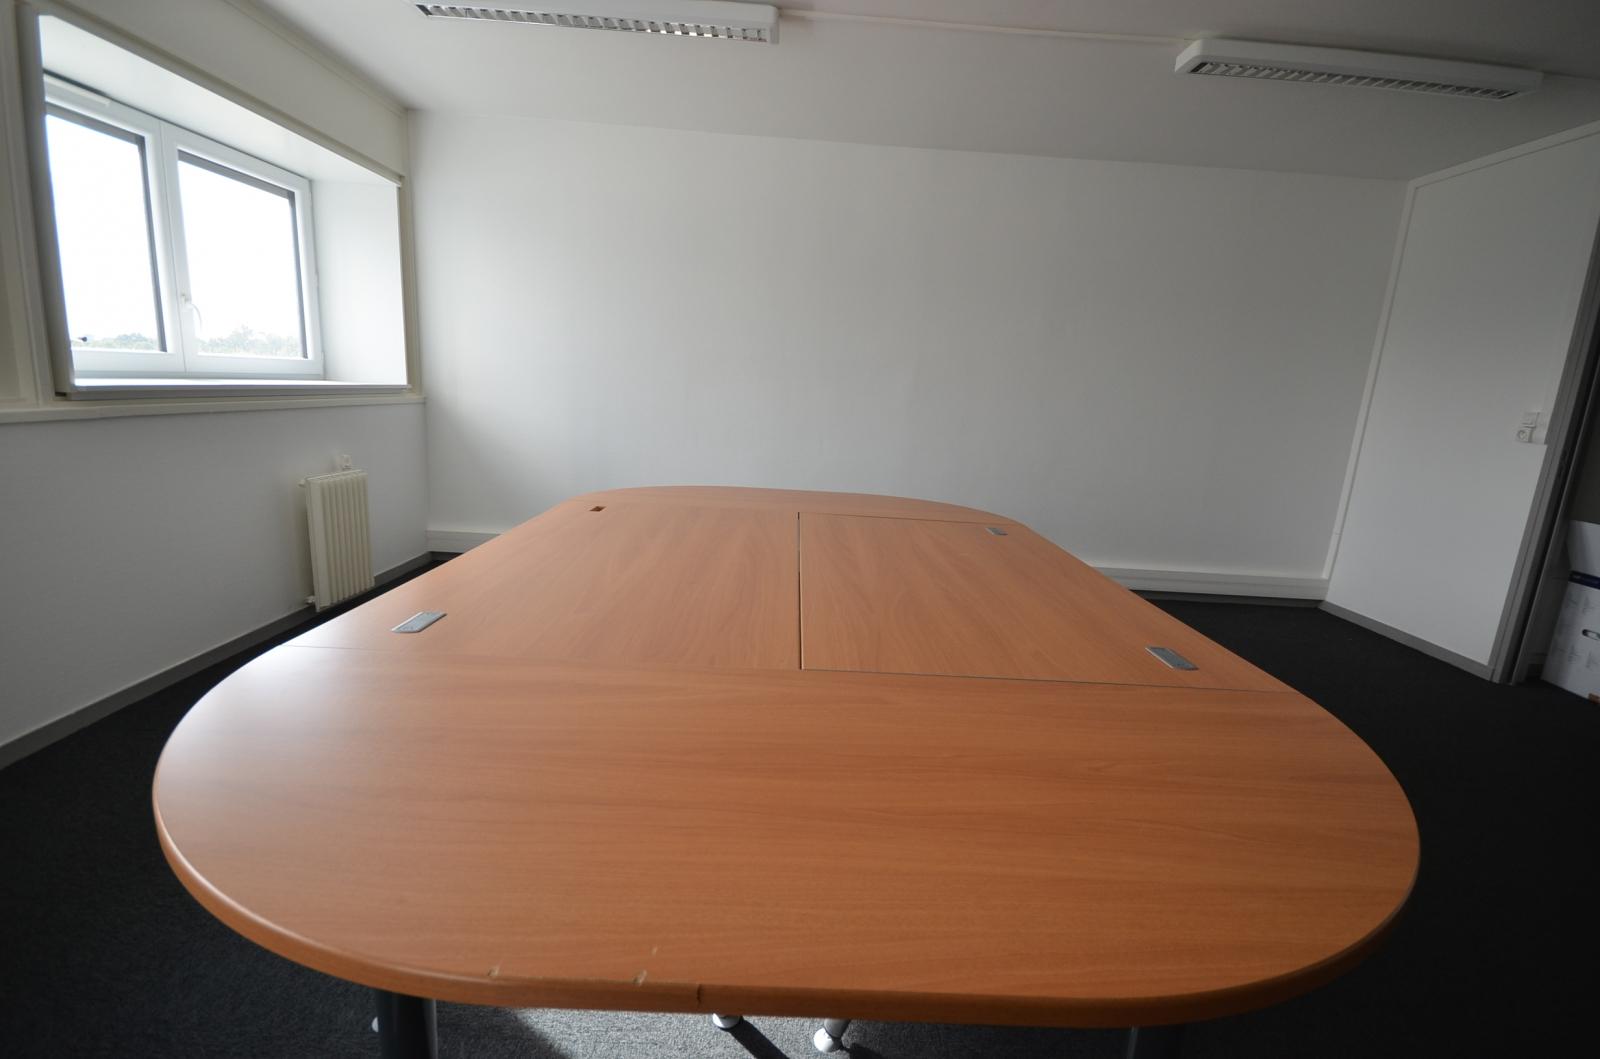 Location coworking saint herblain m² u bureauxlocaux